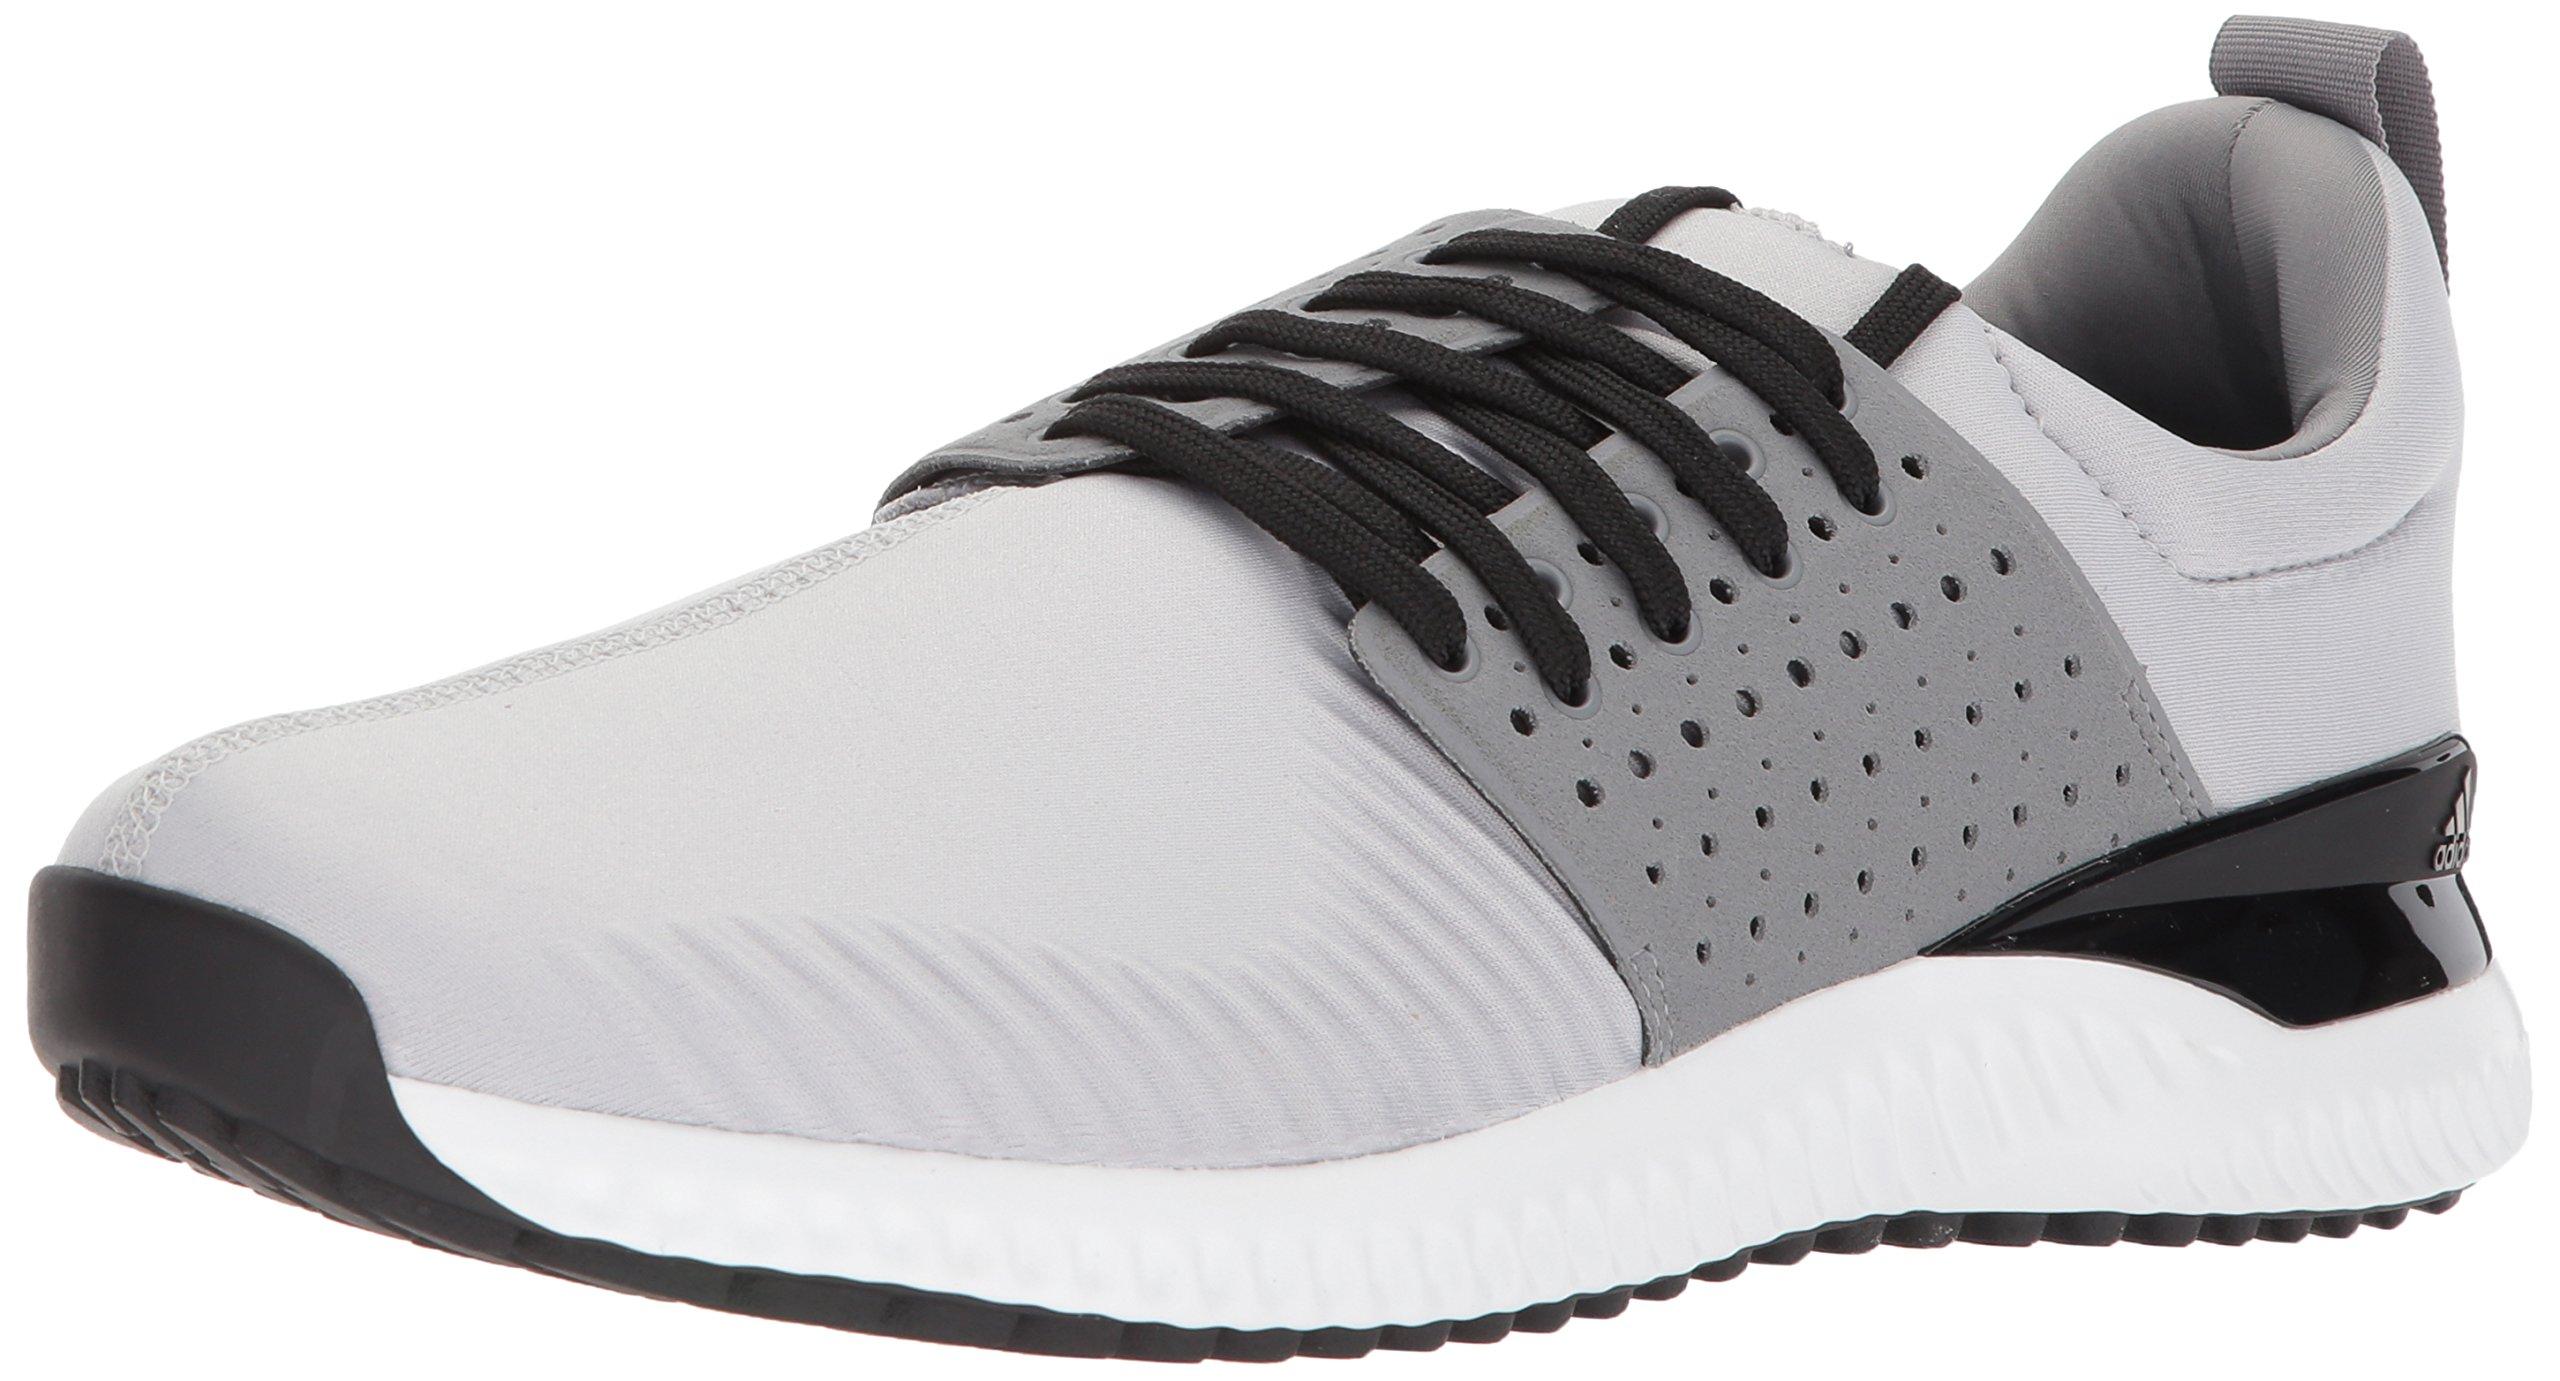 reputable site fba99 3c7f6 Galleon - Adidas Mens Adicross Bounce Golf Shoe, Light Solid GreyBlack,  7.5 M US